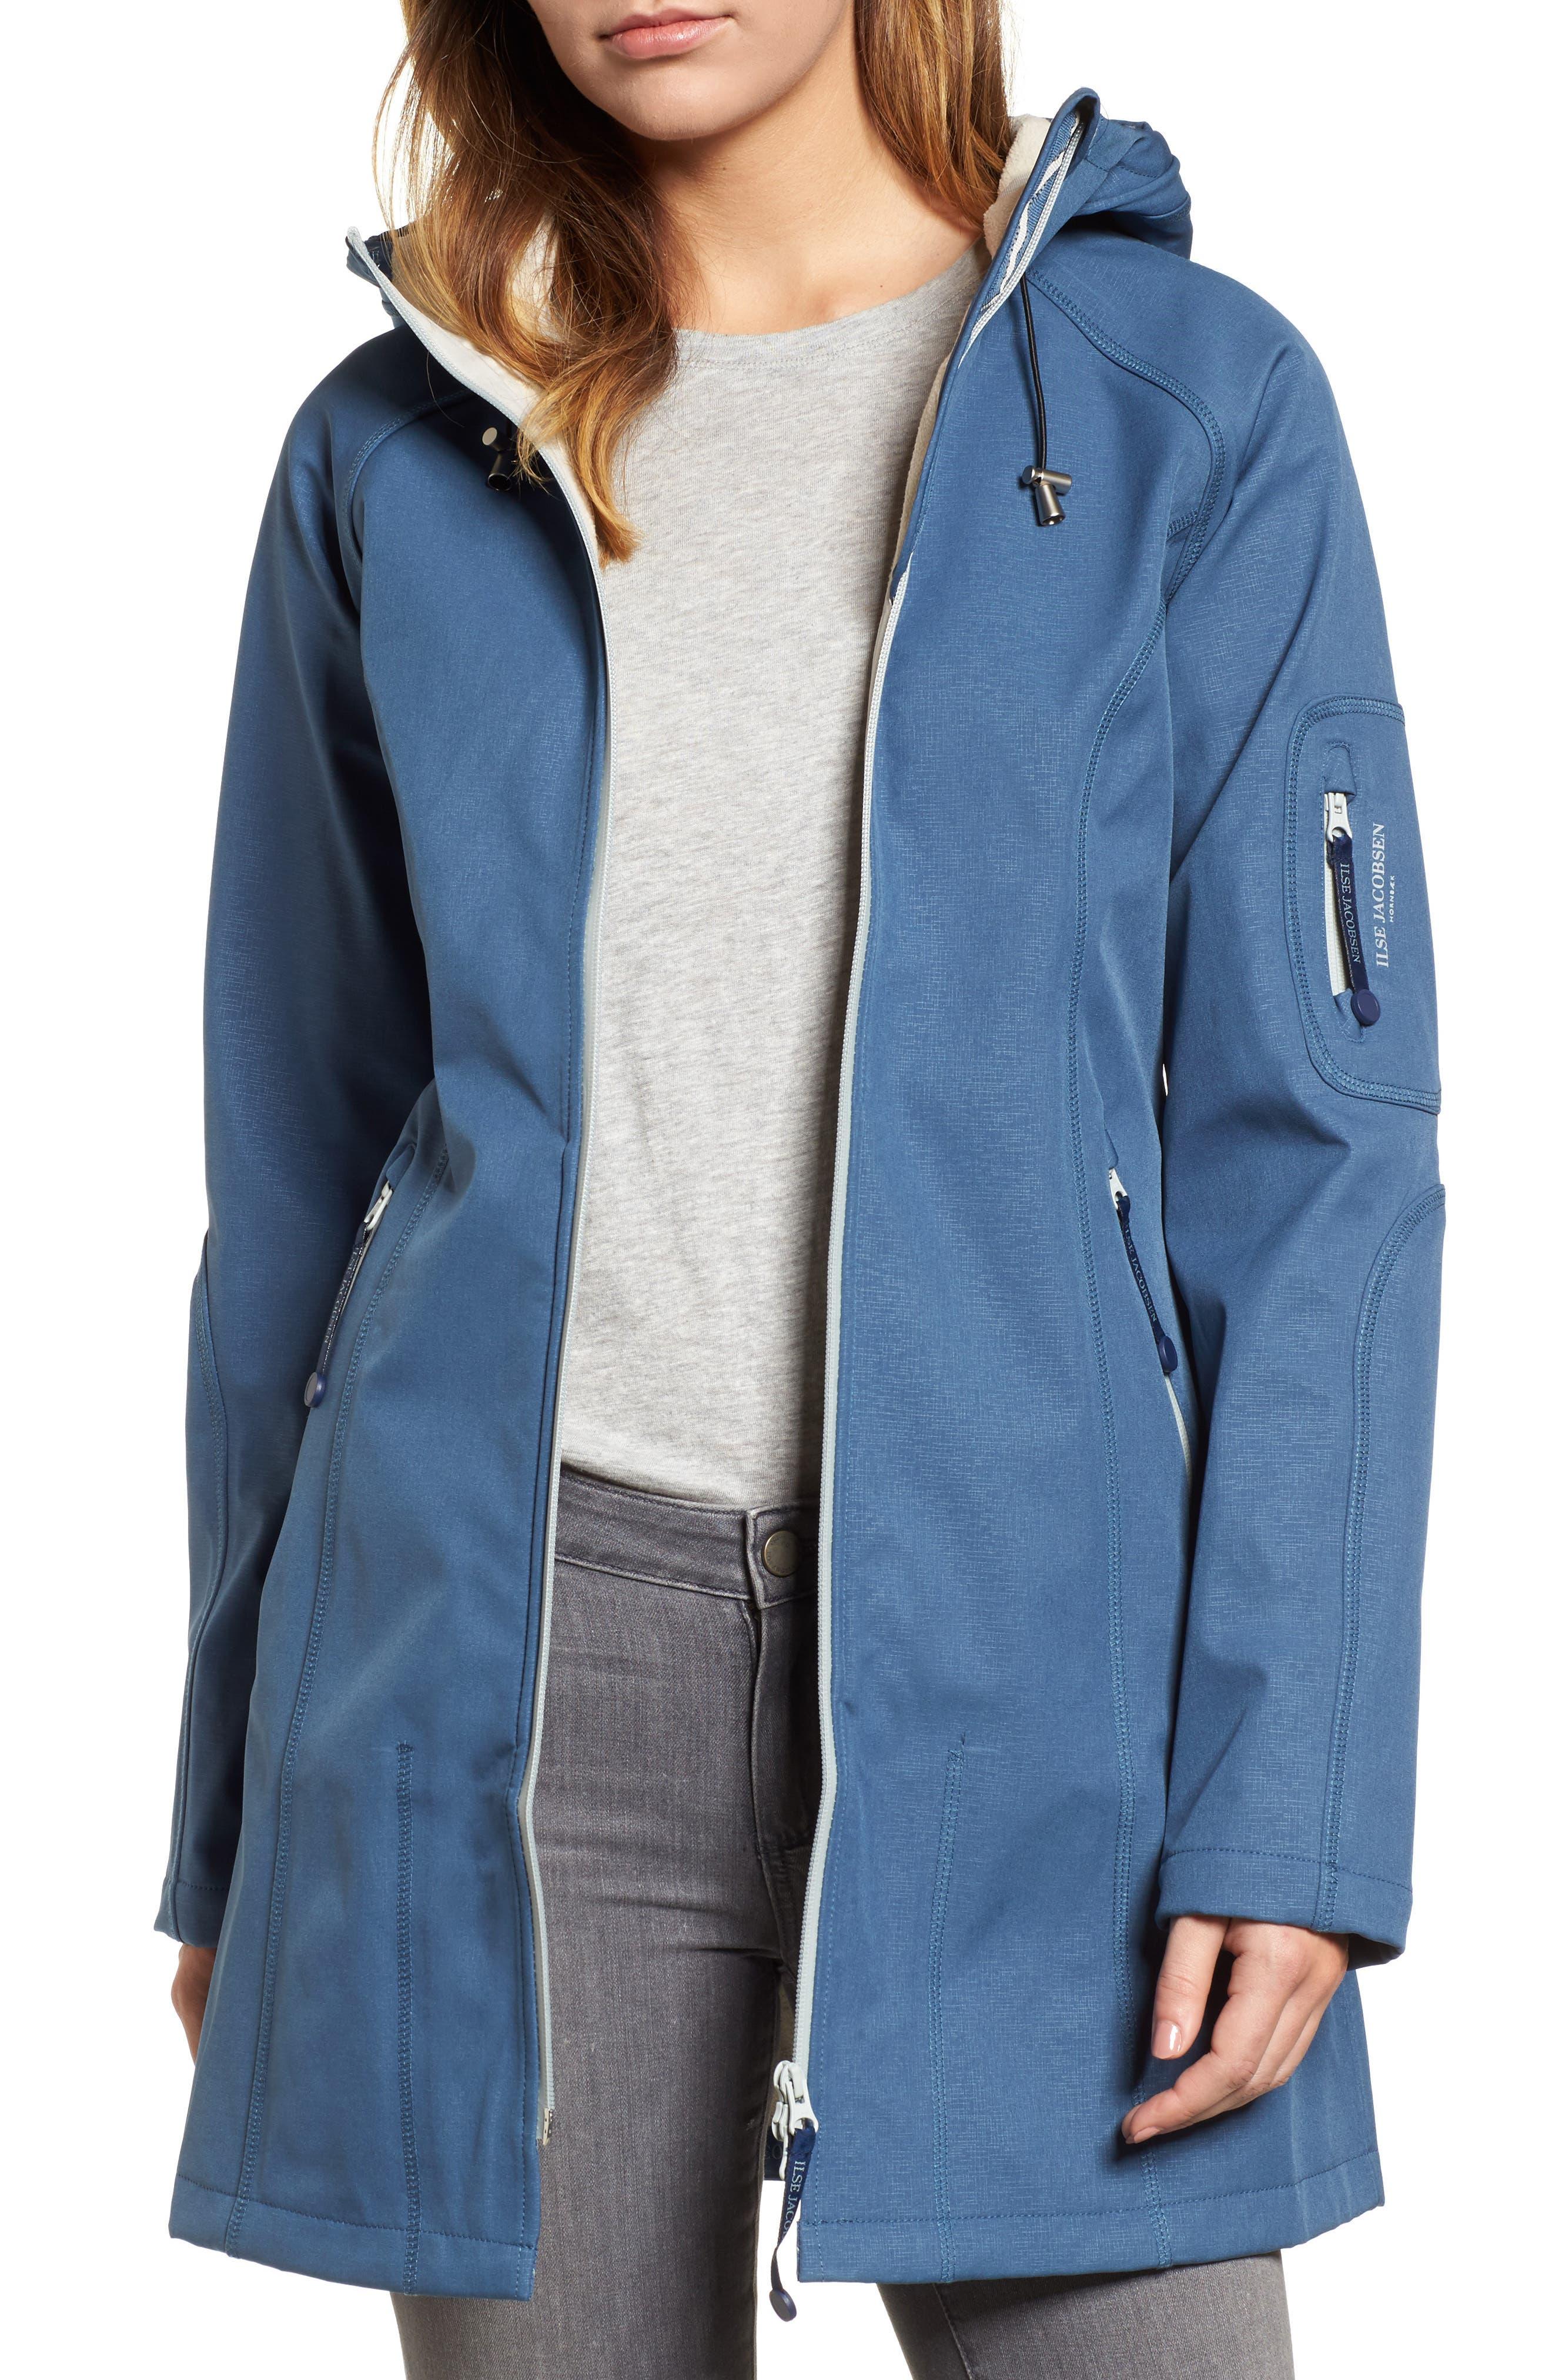 Regular Fit Hooded Raincoat,                             Main thumbnail 1, color,                             400